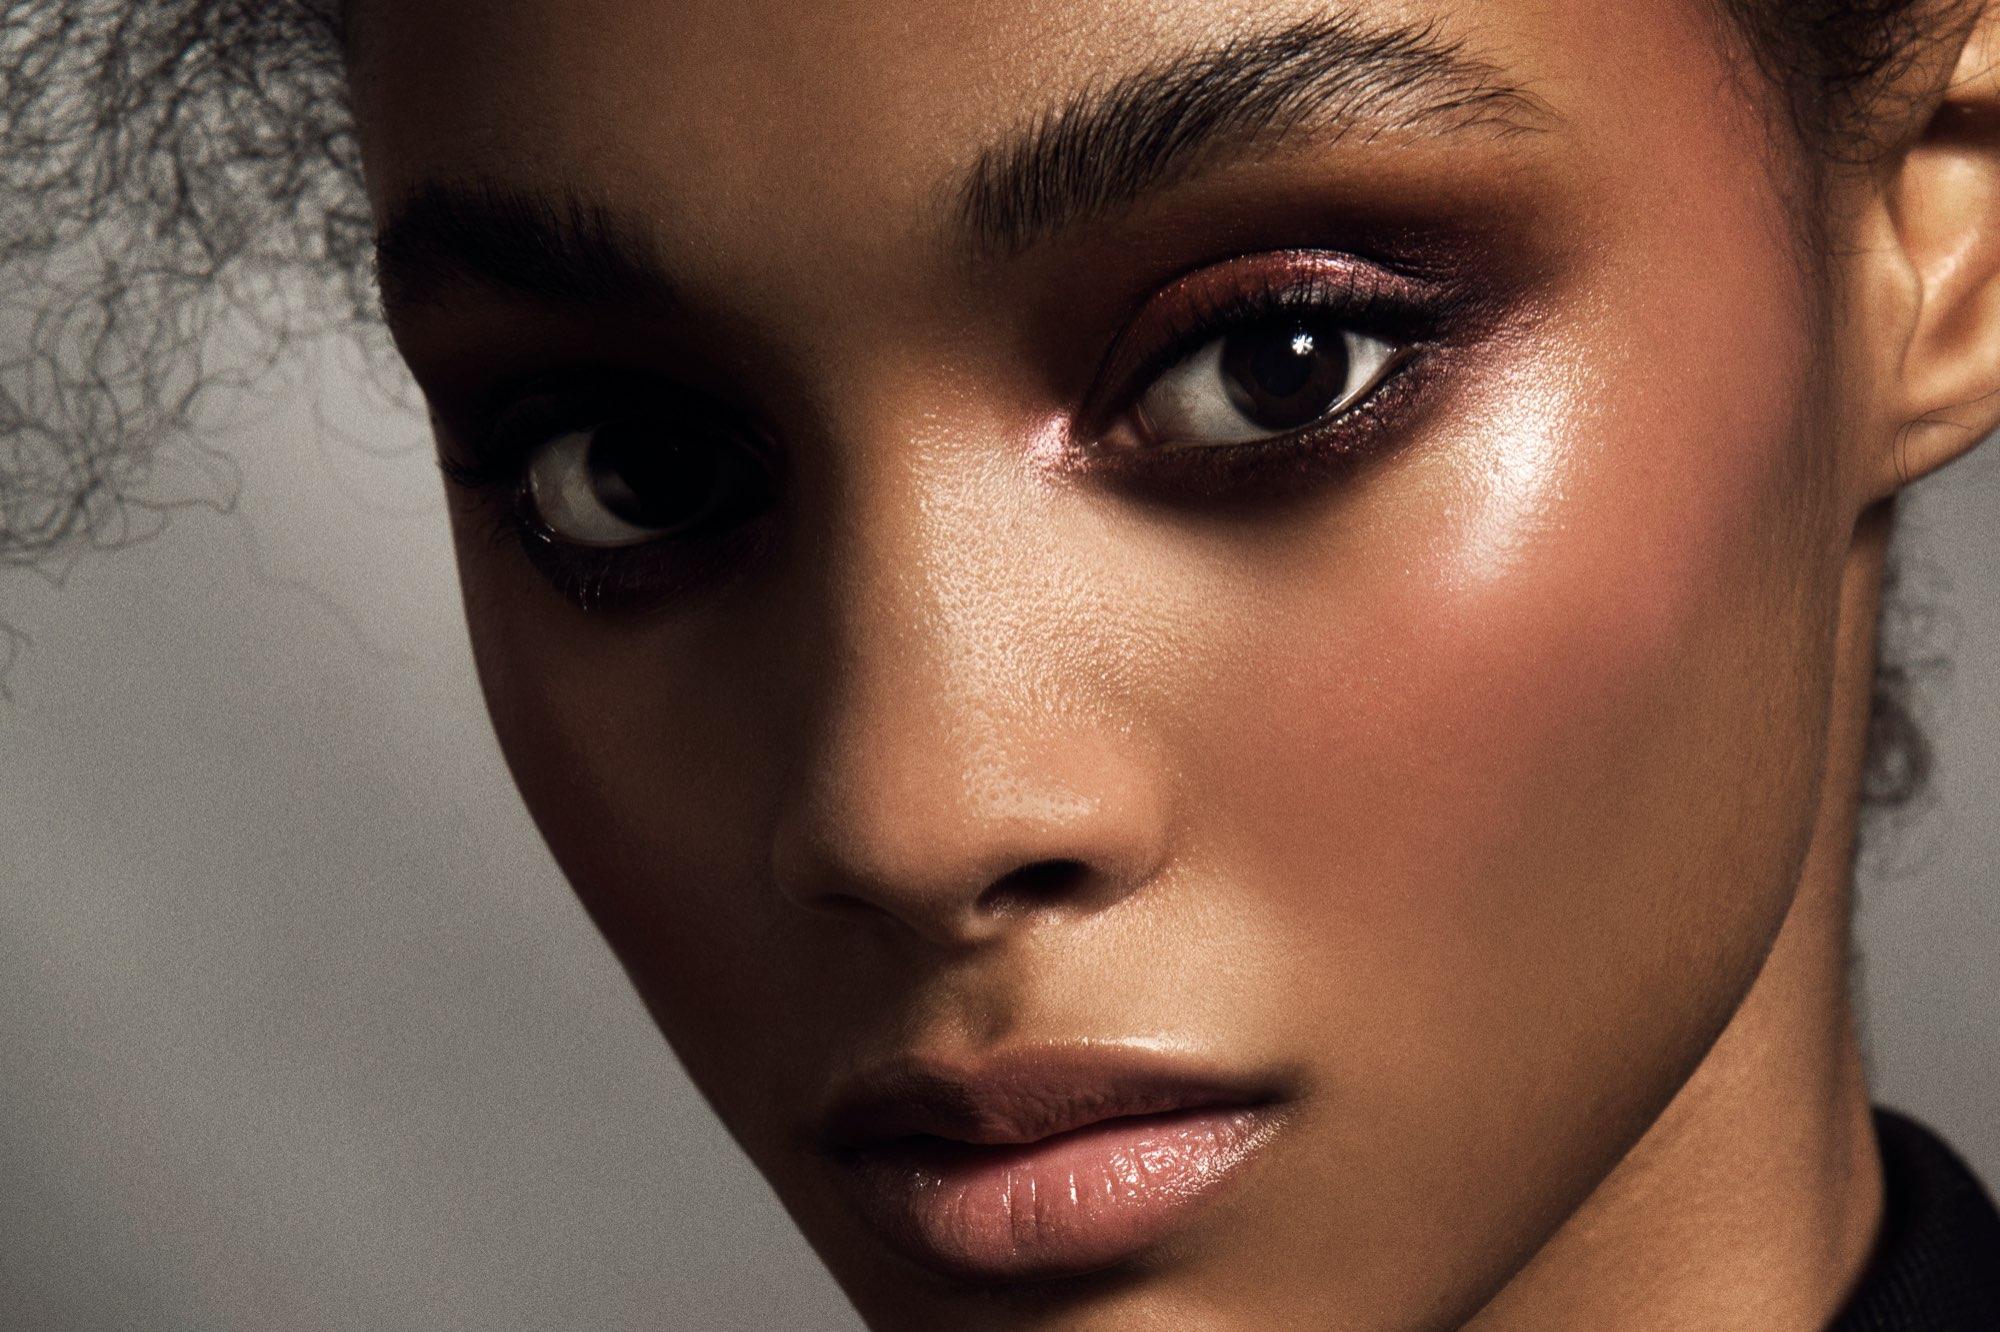 Hair, Nail, Make-up und Fashion styling portfolio / fabienne-pauli - paris--ludyvenka-quer---fotografin-ellin-anderegg--styling-julia-ID539-1.jpeg?v=1585728968